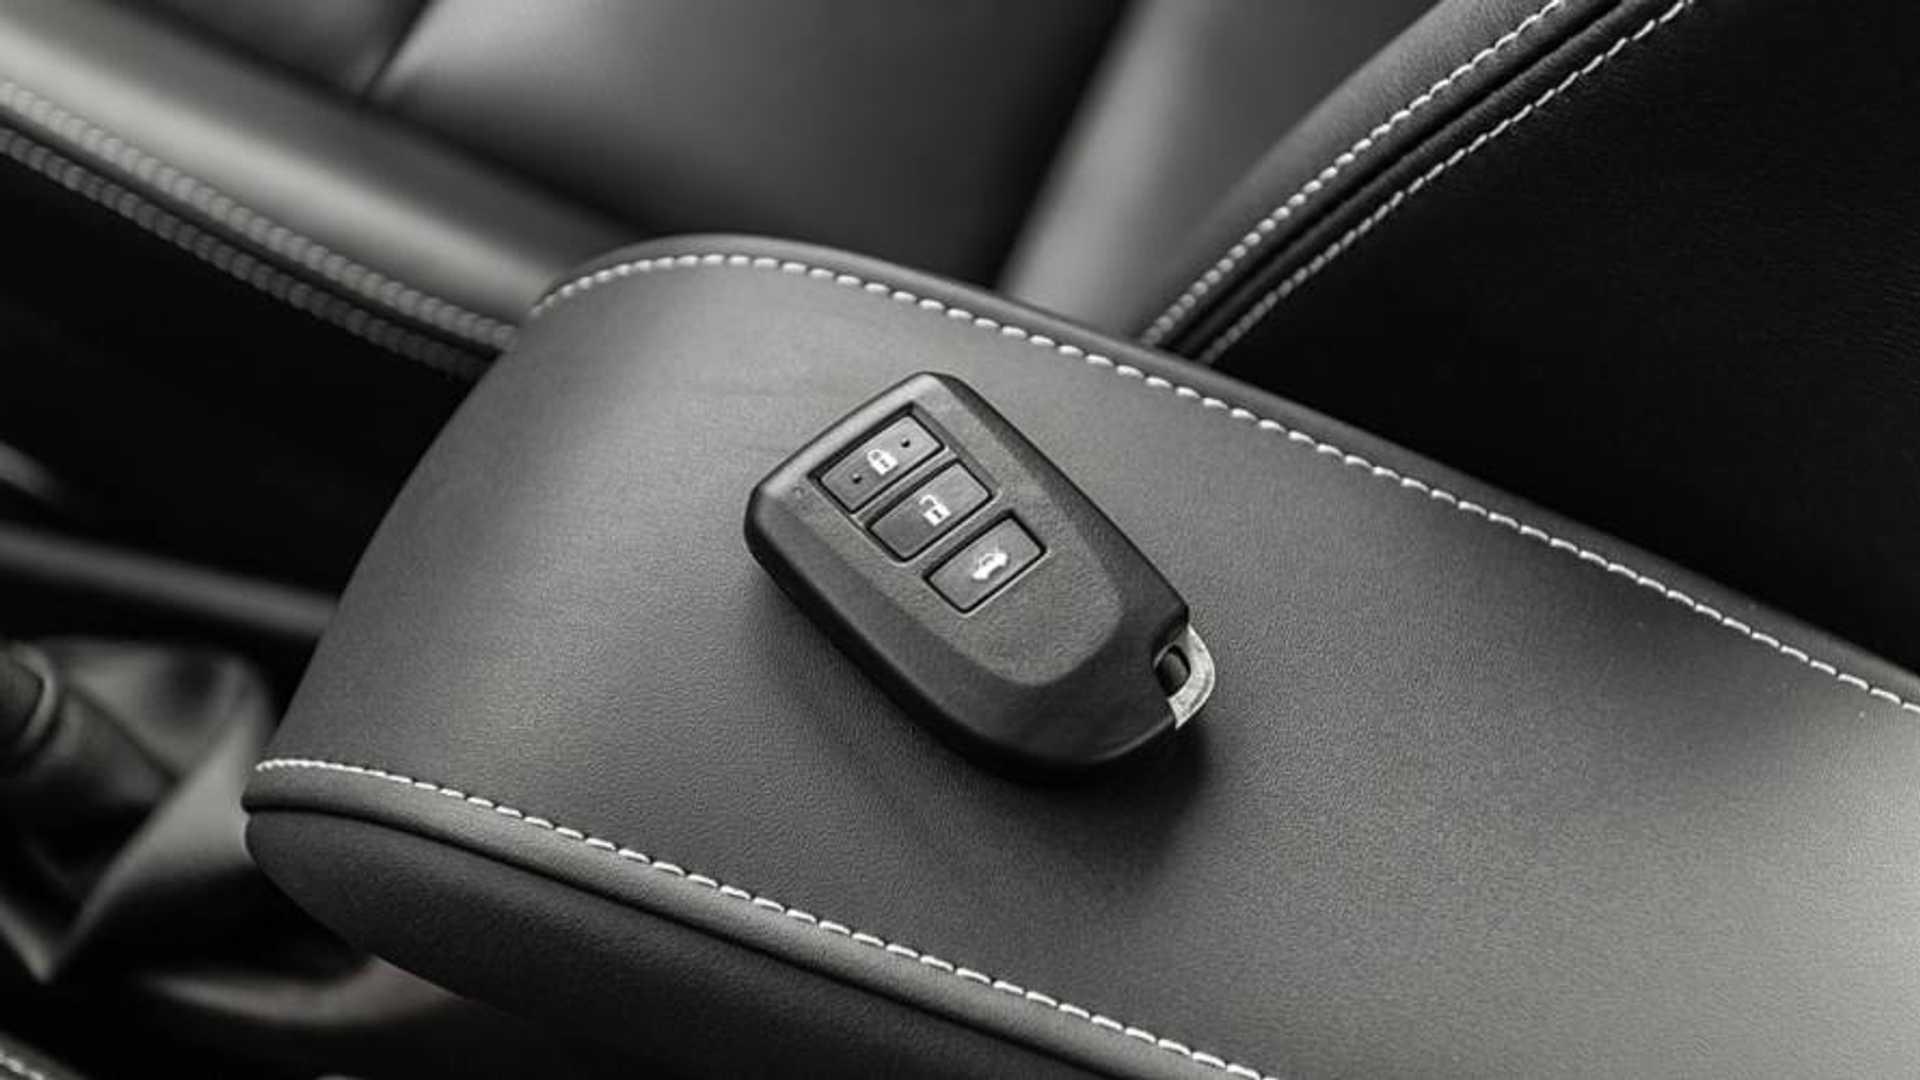 Toyota Yaris Hatch fica mais caro - Veja tabela de preços completa Toyota-yaris-13-xl-plus-tech-teste-br